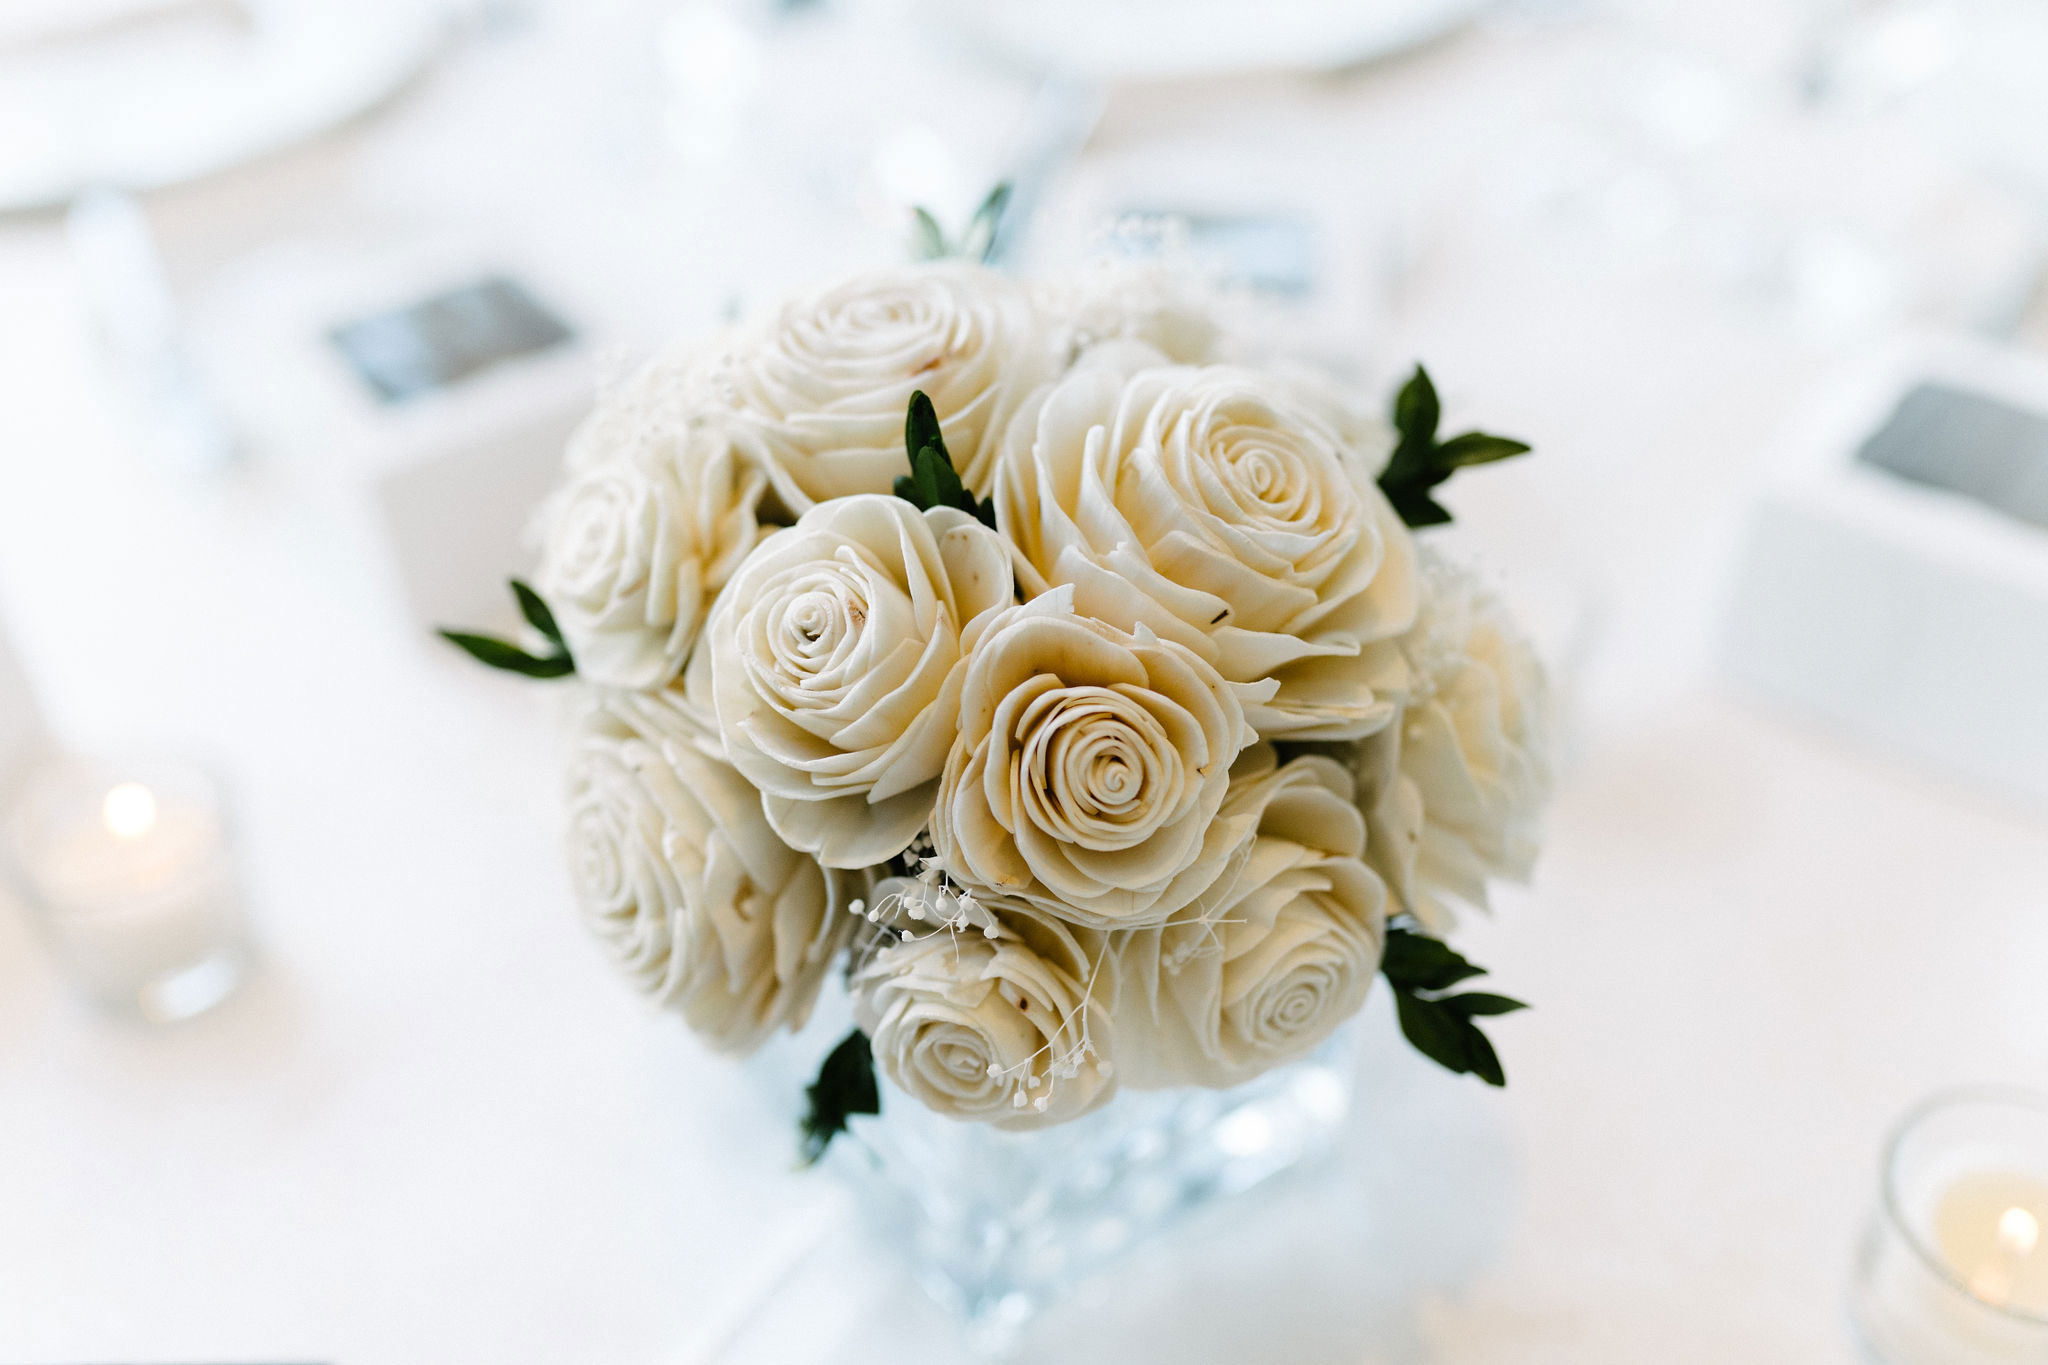 038-rempel-photography-chicago-wedding-inspiration-sara-philip-rockefeller-chapel-trump-tower.jpg